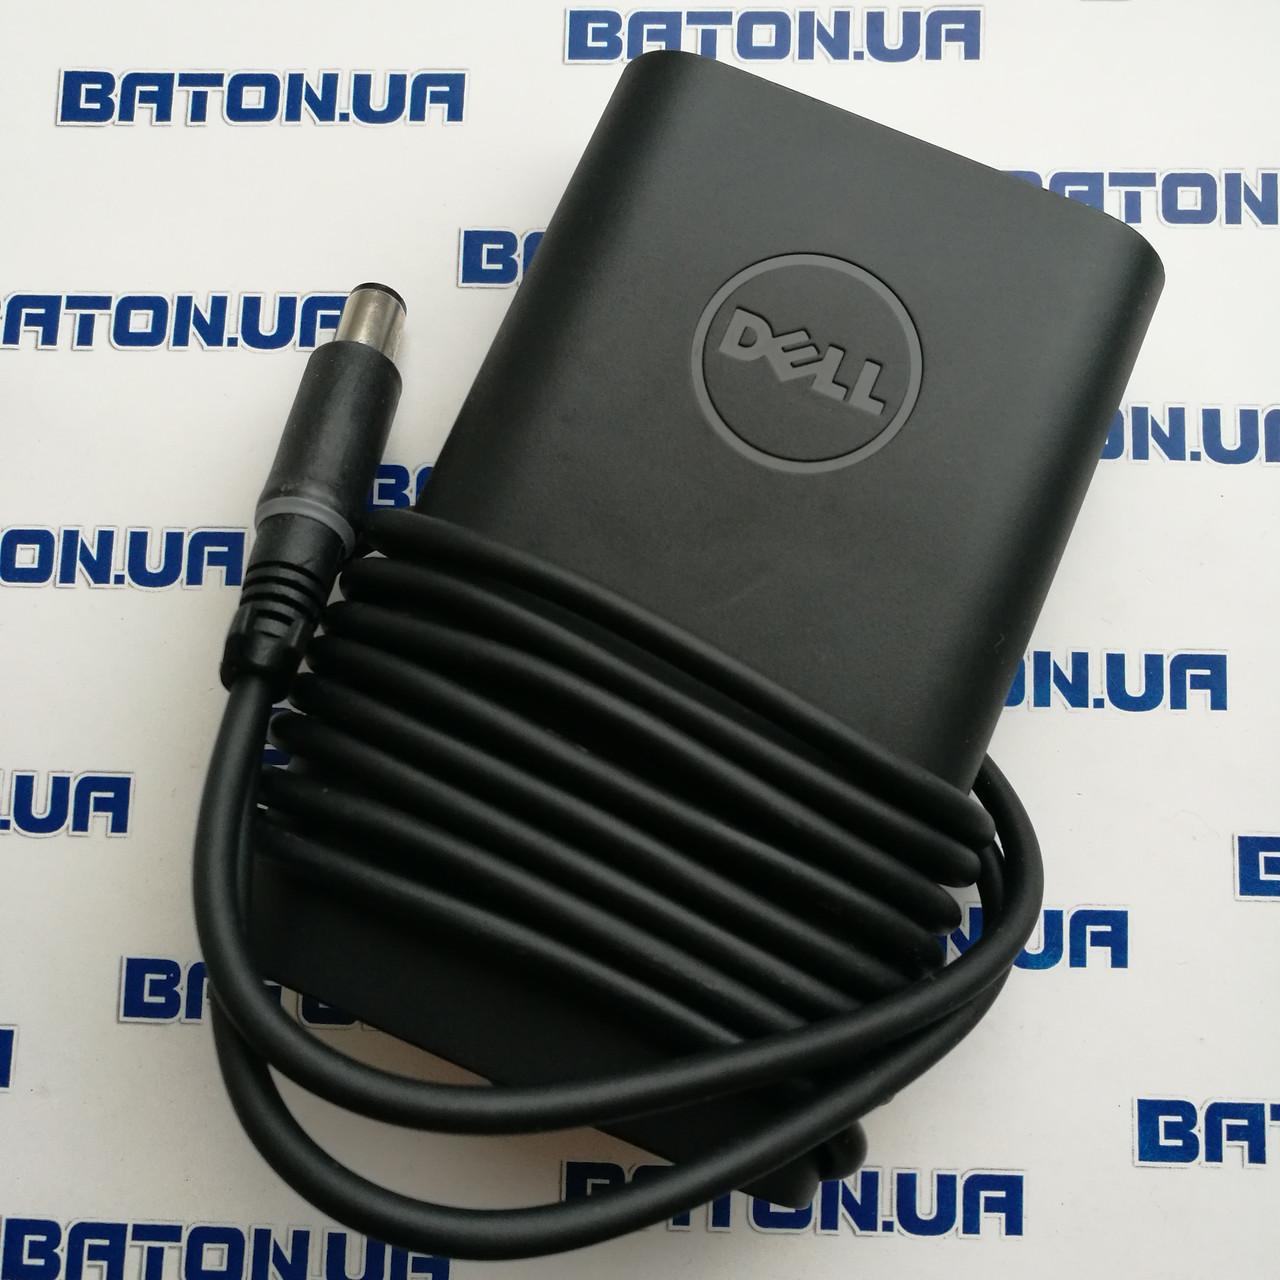 Блок питания Dell 7.4*5.0 19.5V 3.34A 65W HA65NM130 Зарядное устройство для ноутбука Dell Original STOK